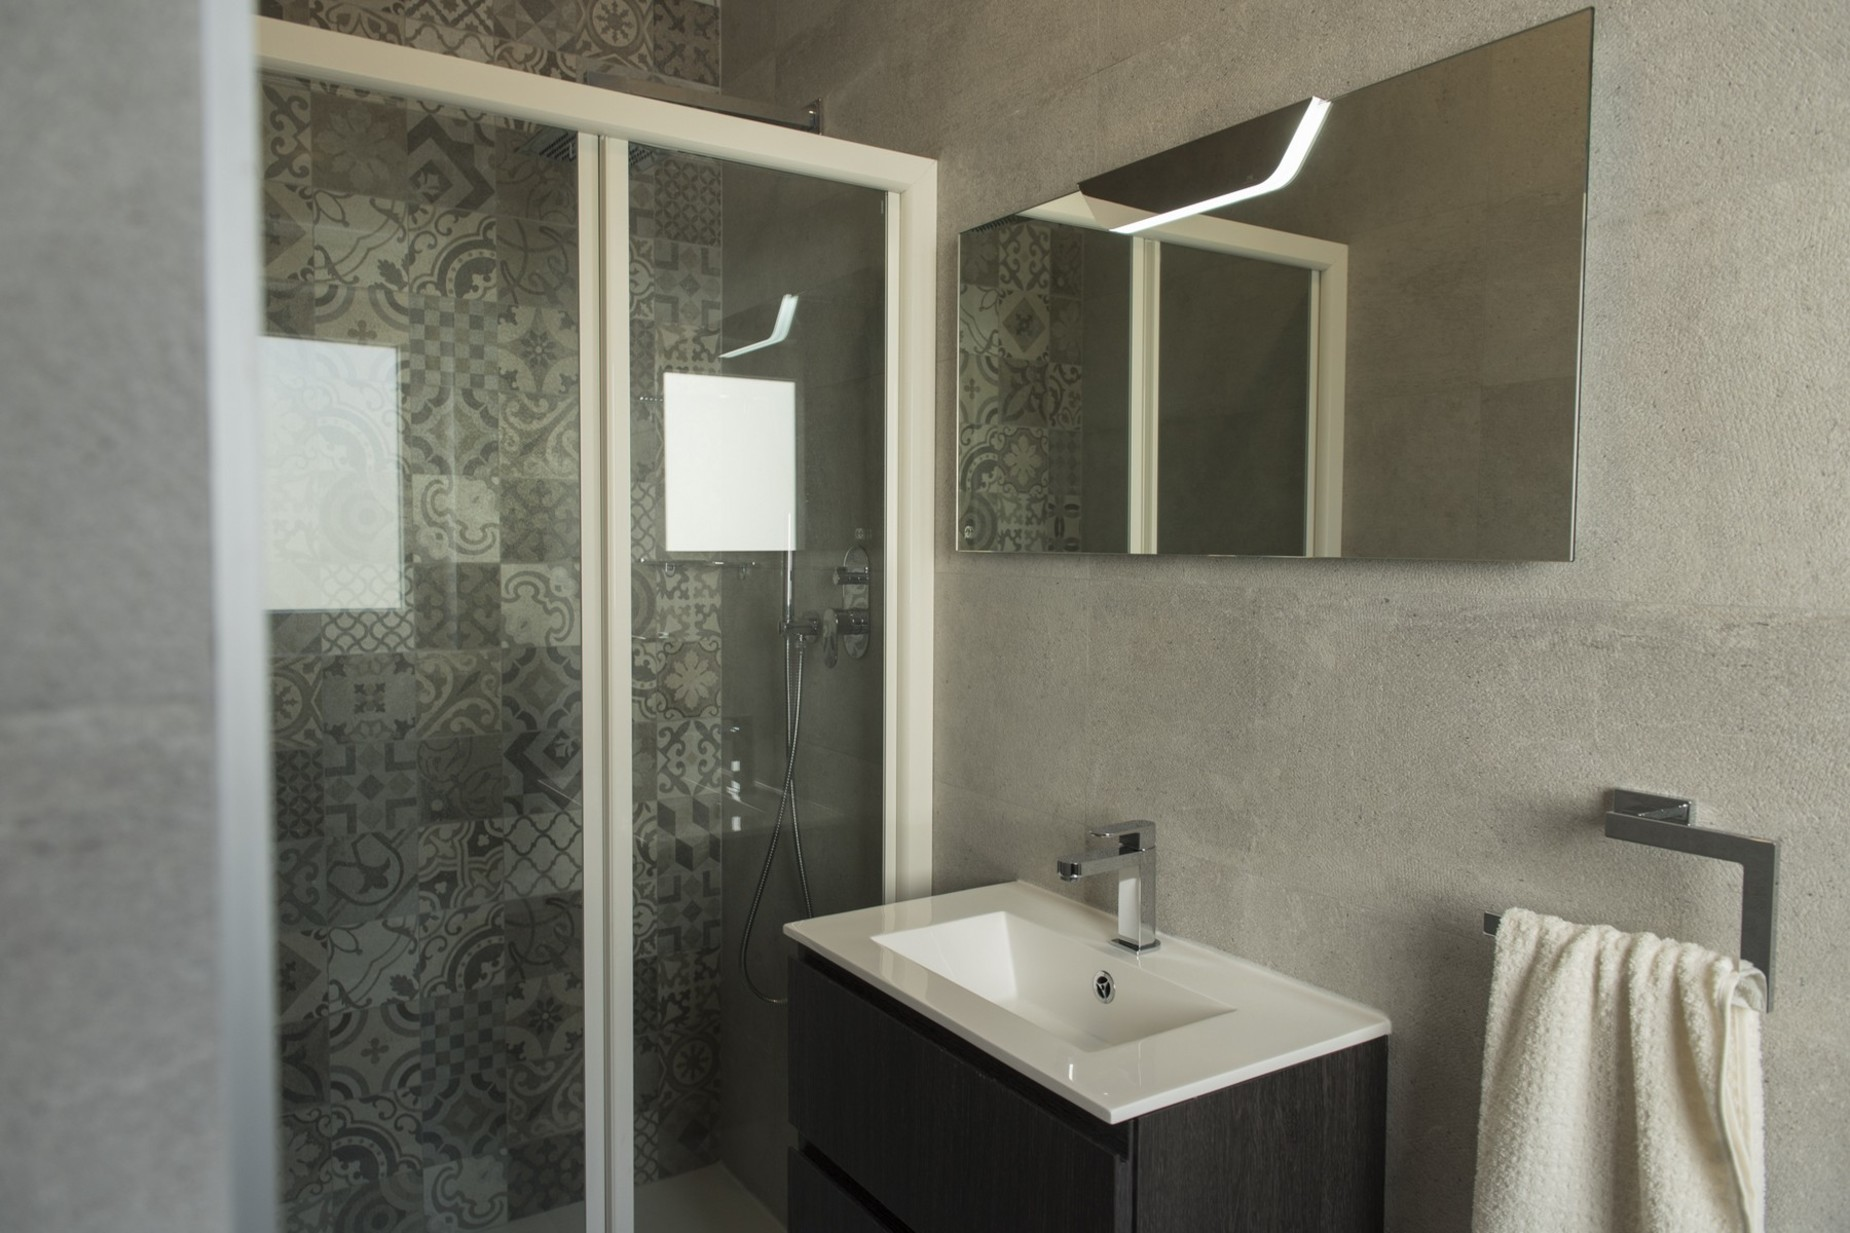 3 bed Villa For Rent in Ibragg, Ibragg - thumb 11